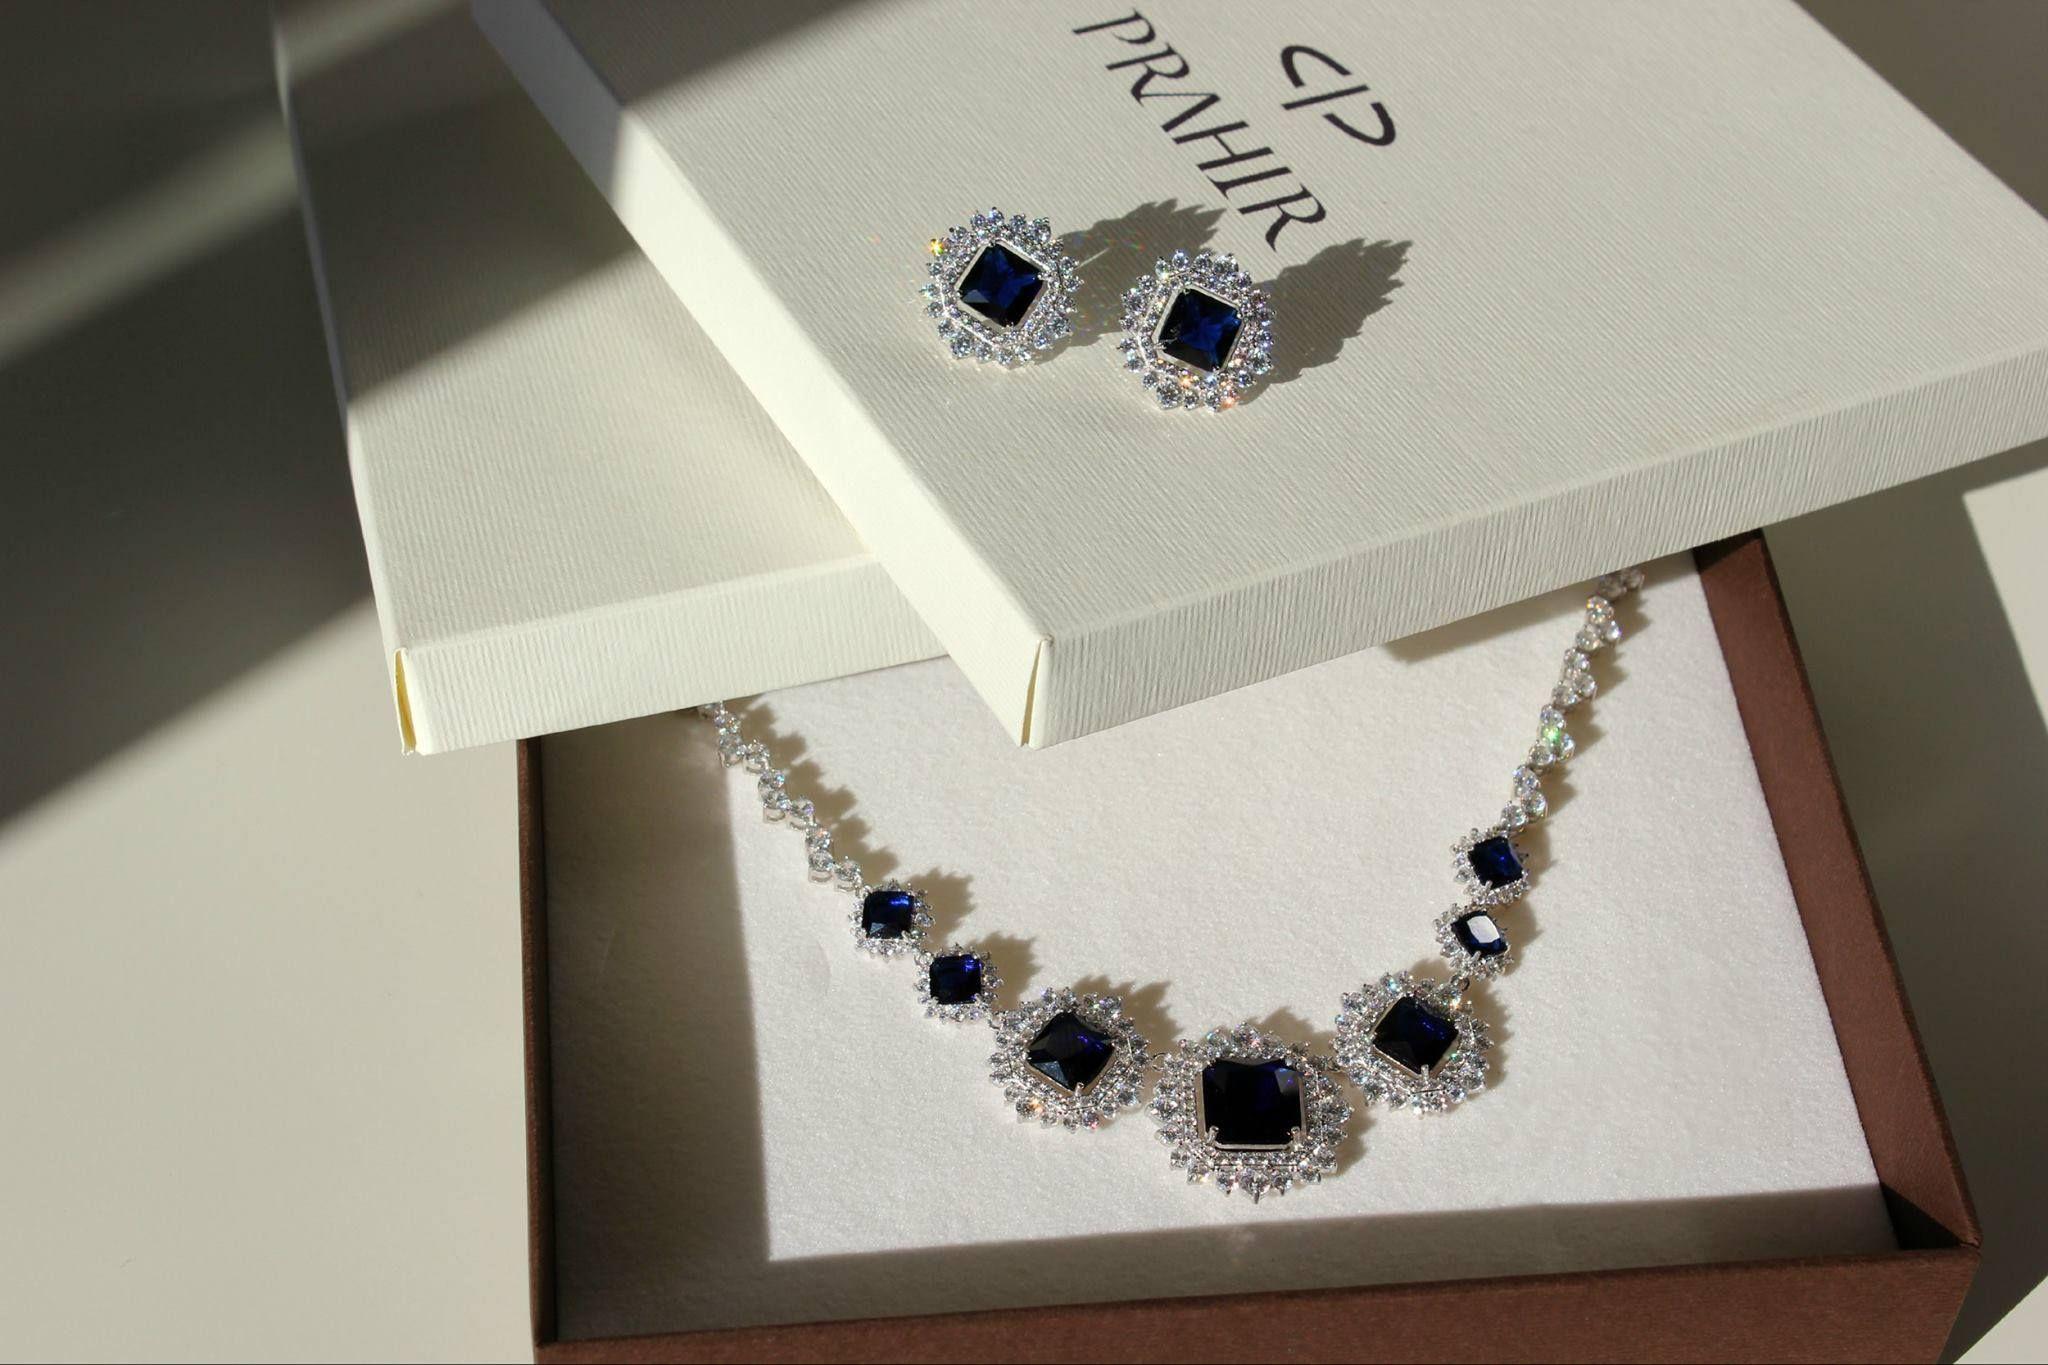 With dark blue stones